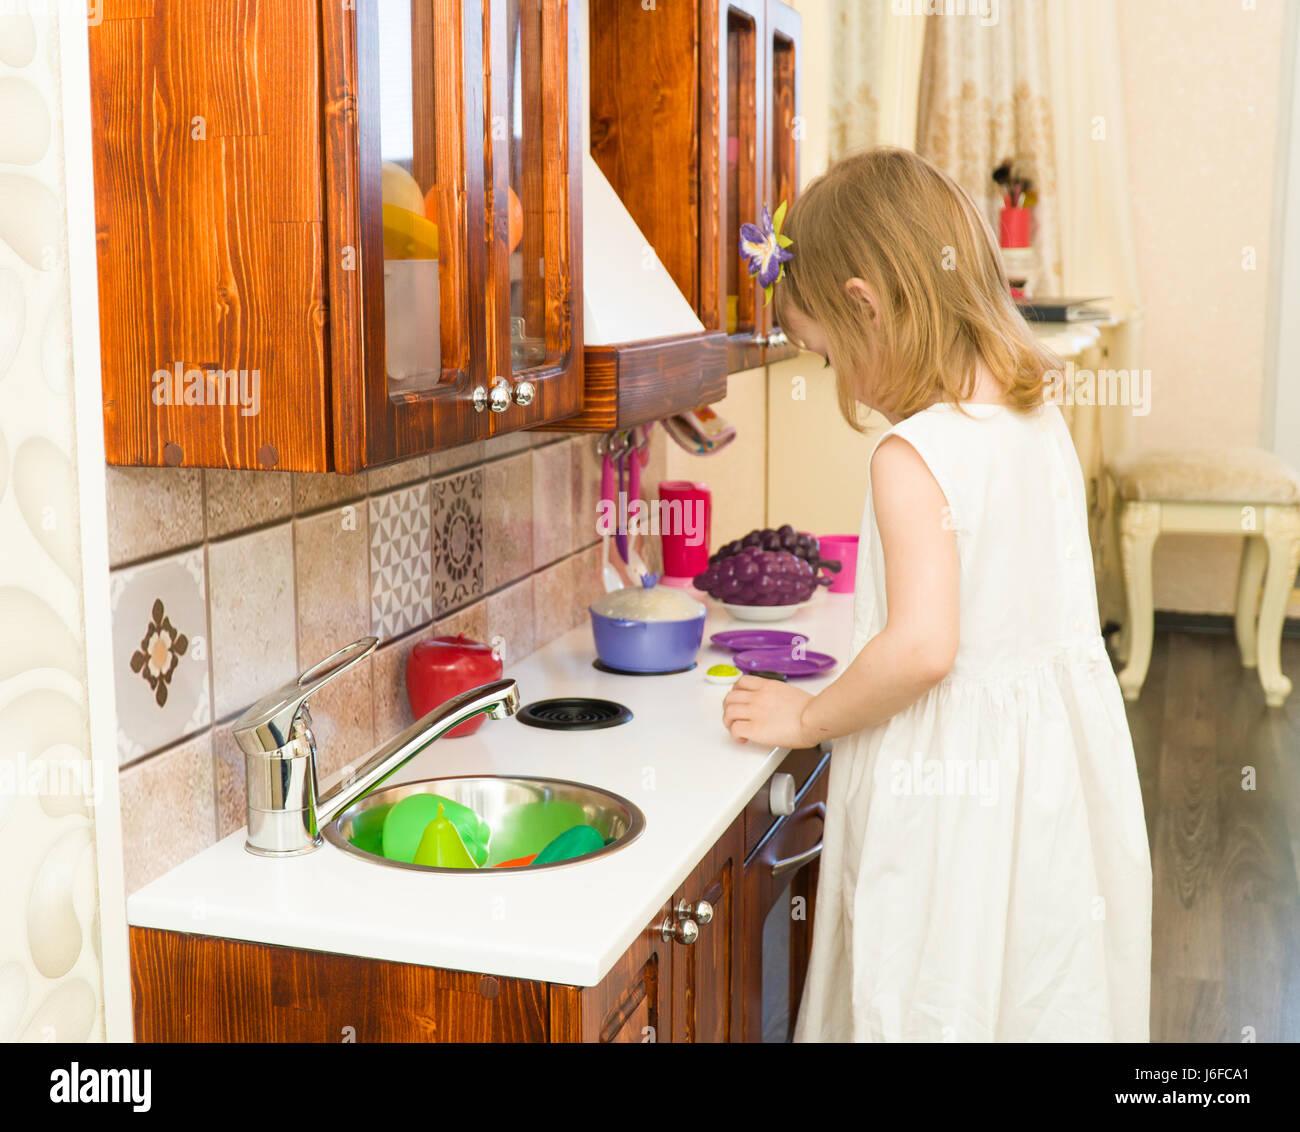 Preschool Kitchen Furniture Retro Kitchen Child Stock Photos Retro Kitchen Child Stock